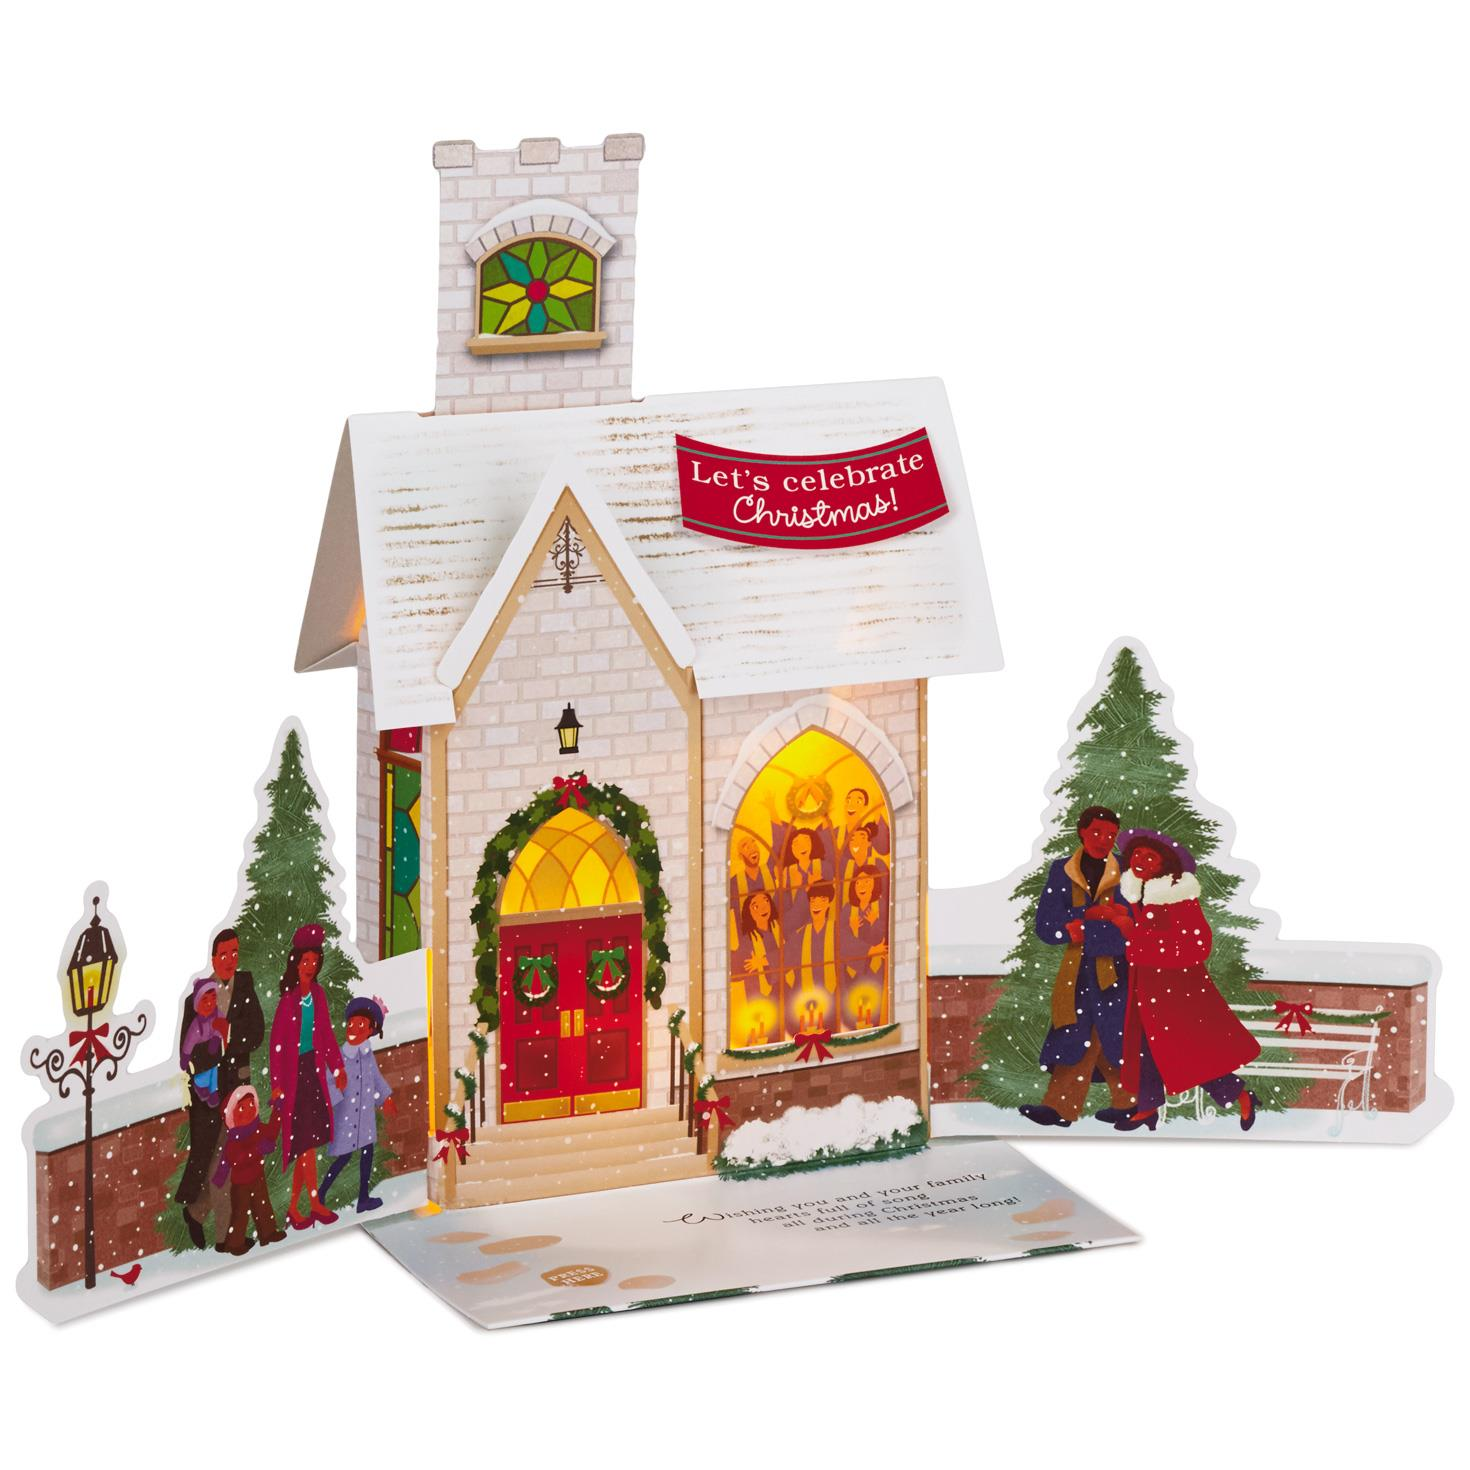 Snowy Church Pop Up Musical Christmas Card With Light